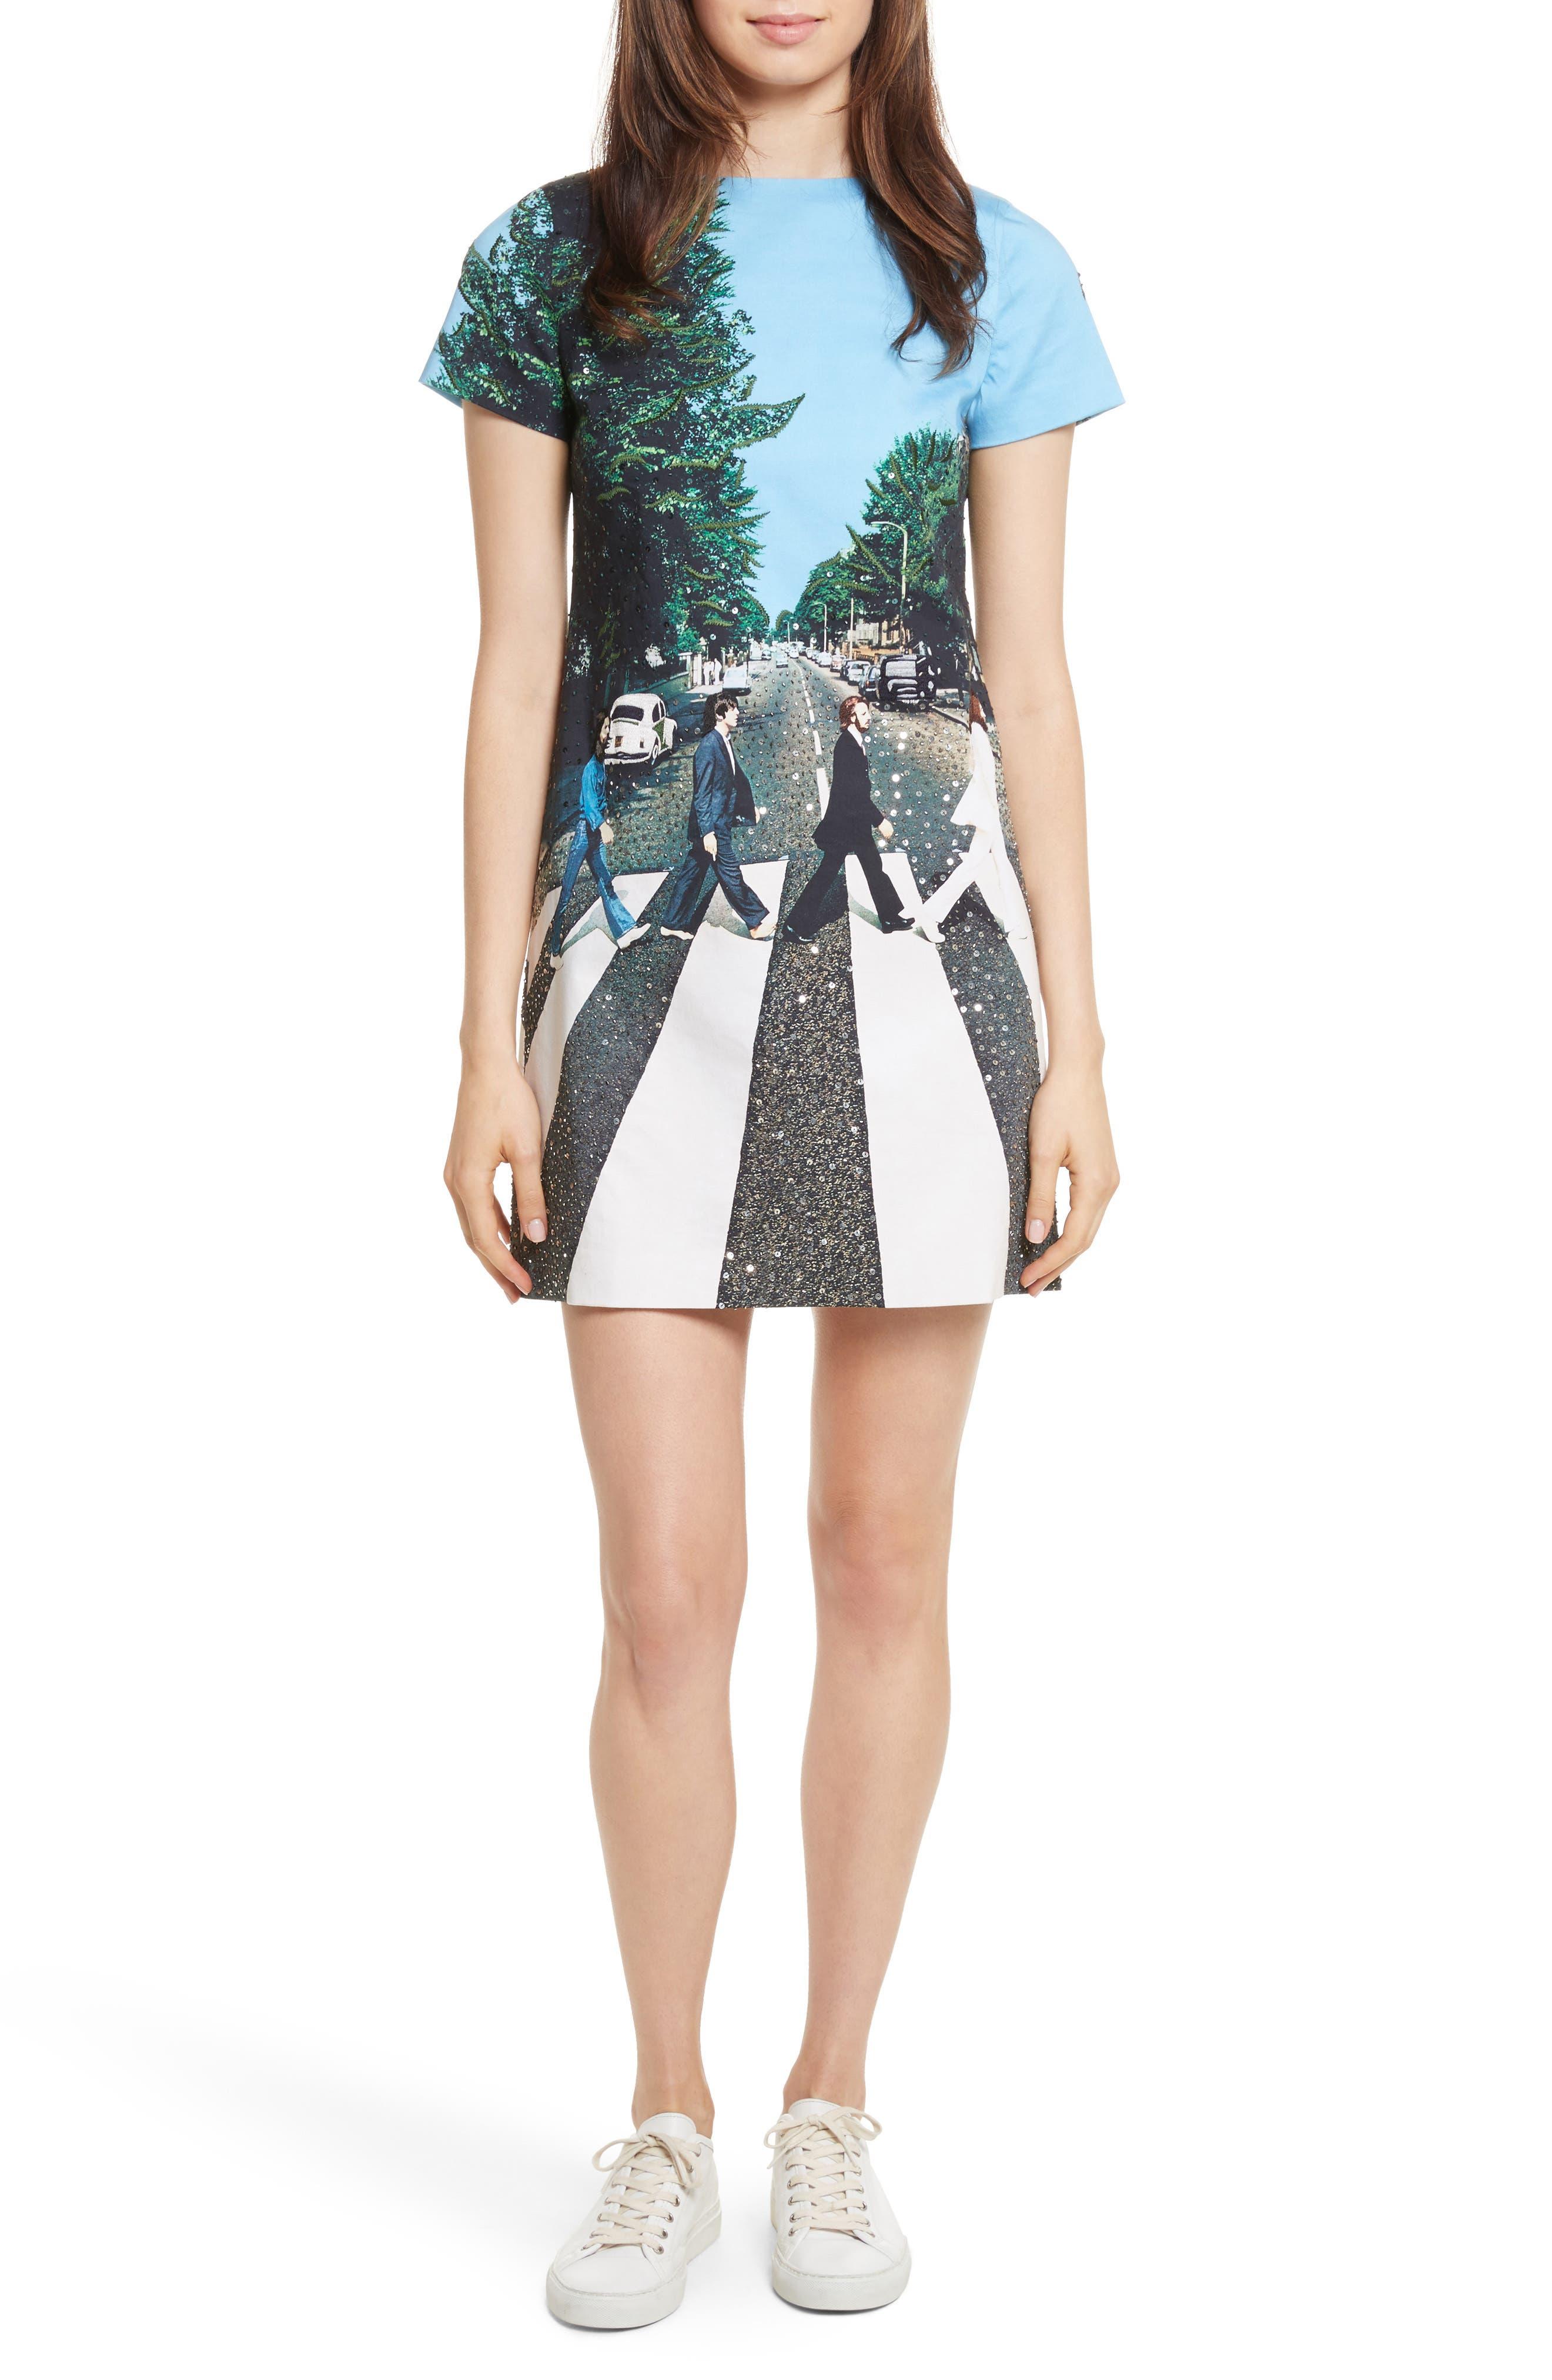 ALICE + OLIVIA,                             AO x The Beatles Sequined Shift Dress,                             Main thumbnail 1, color,                             473